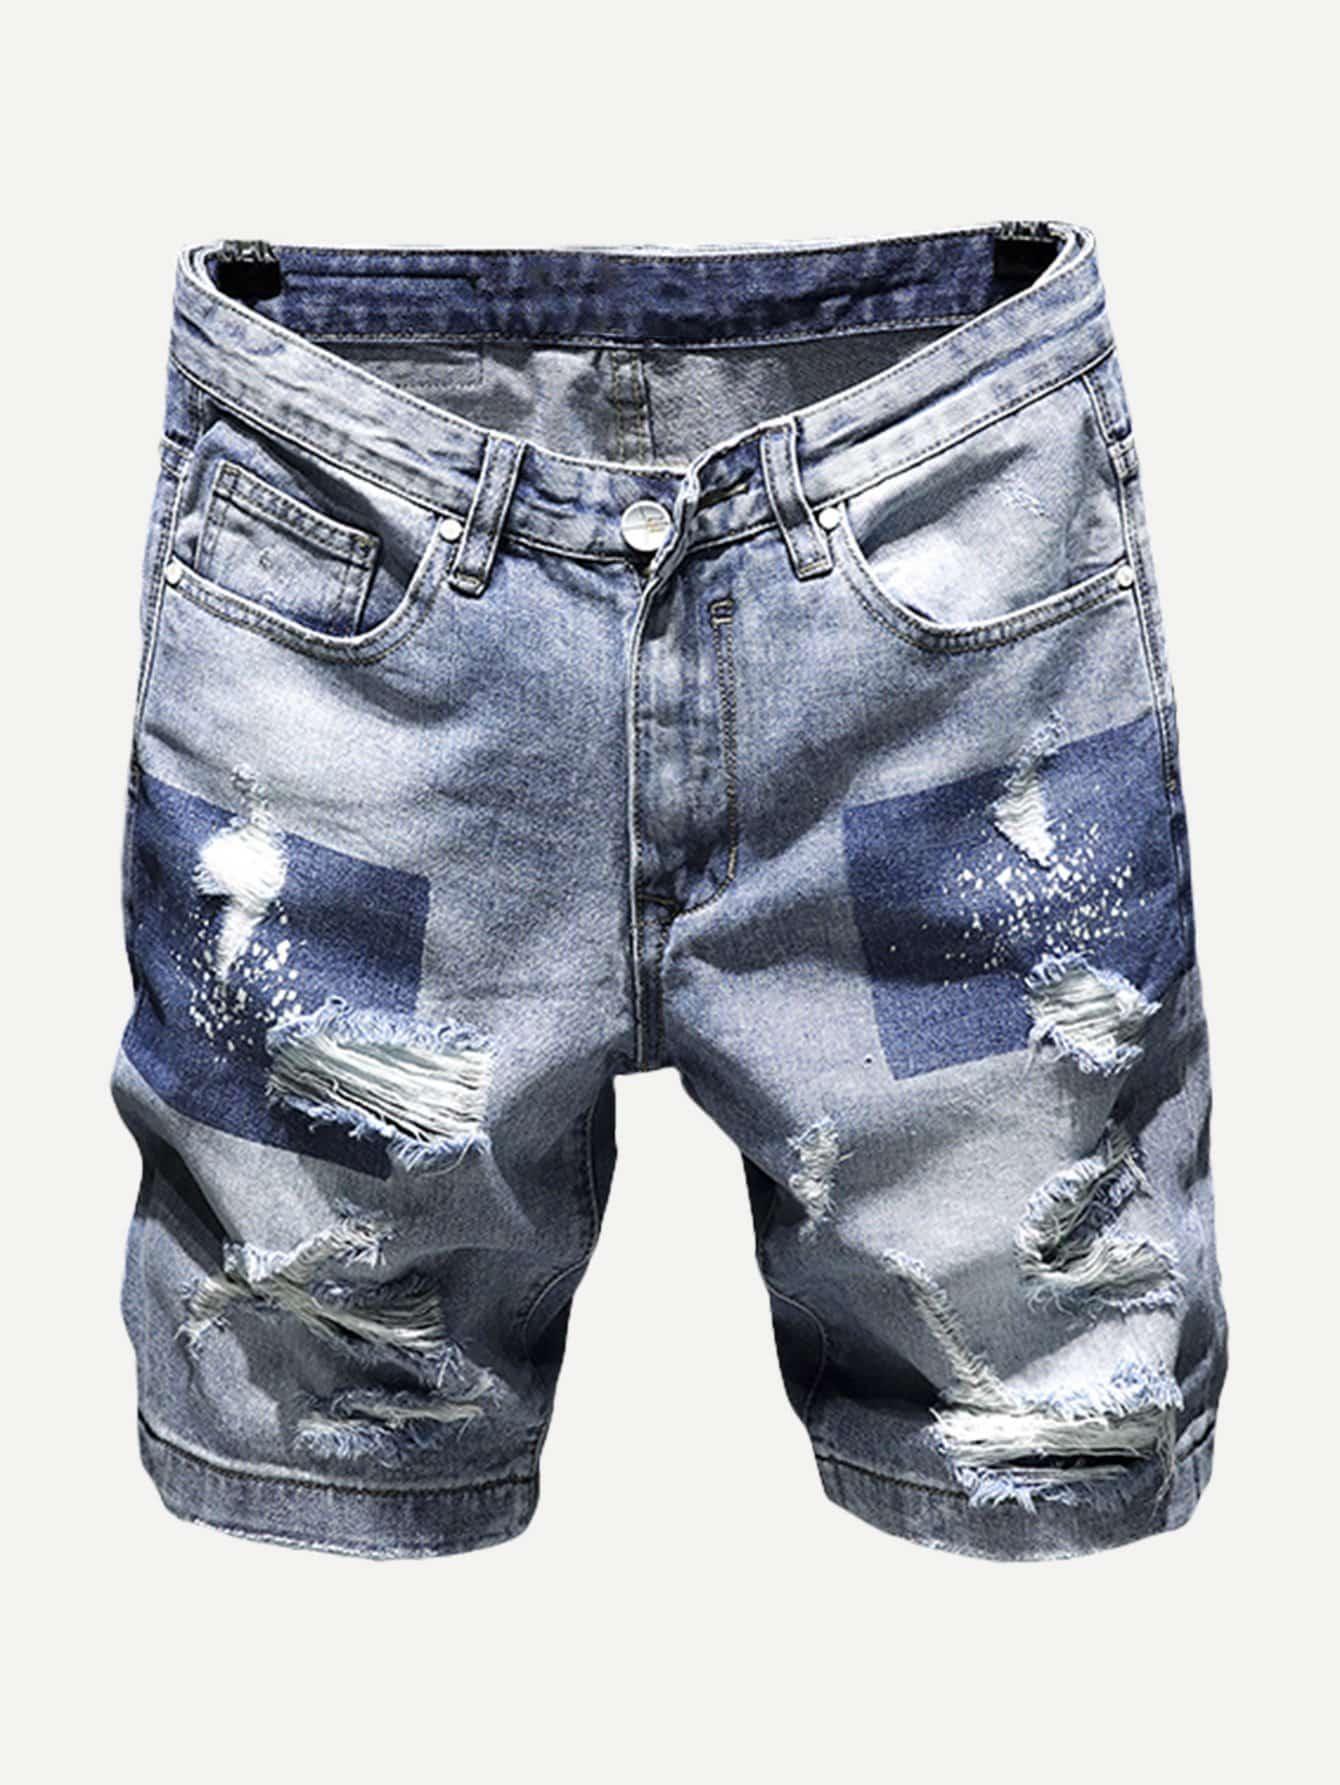 m nner zerrissene jeans shorts german shein sheinside. Black Bedroom Furniture Sets. Home Design Ideas